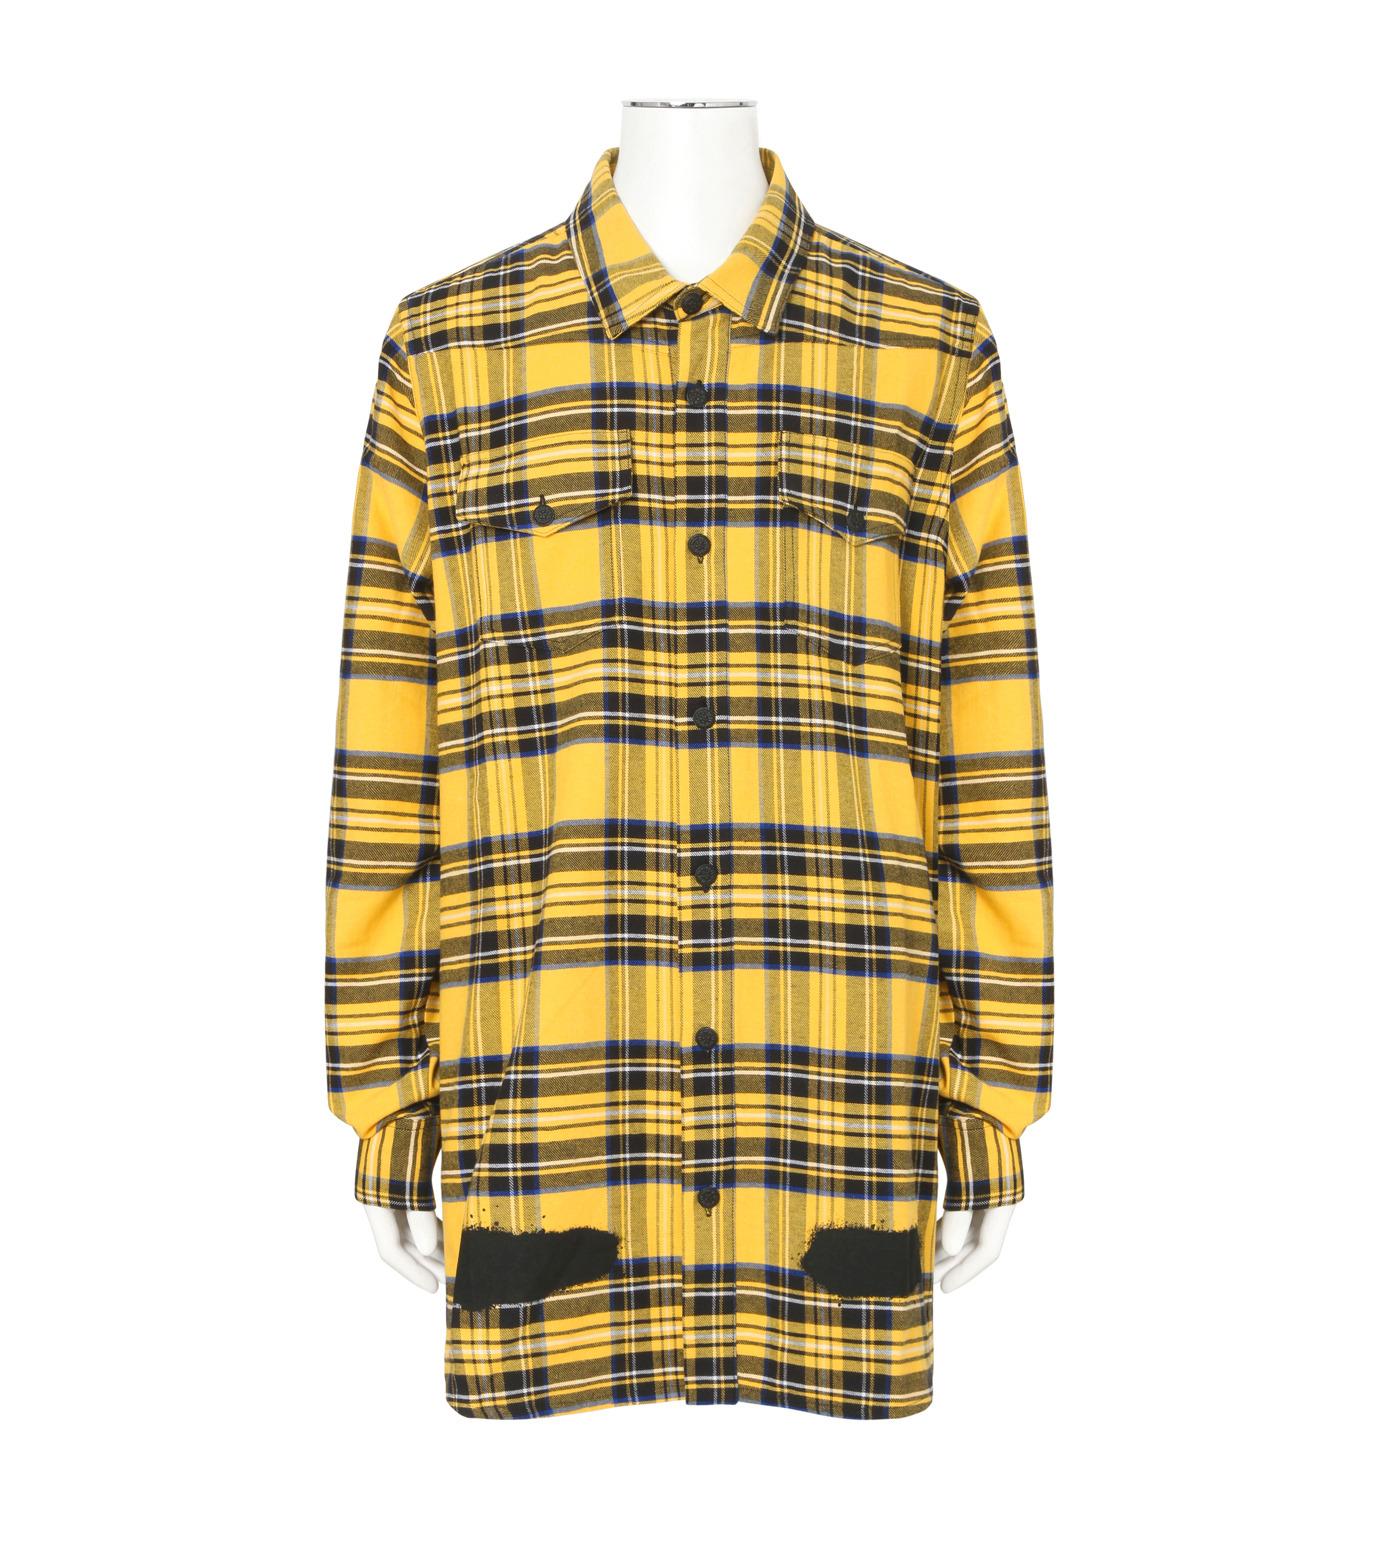 Off White(オフホワイト)のDIAG SPRAY CHECK SHIRT-YELLOW(シャツ/shirt)-001S7367013-32 拡大詳細画像1